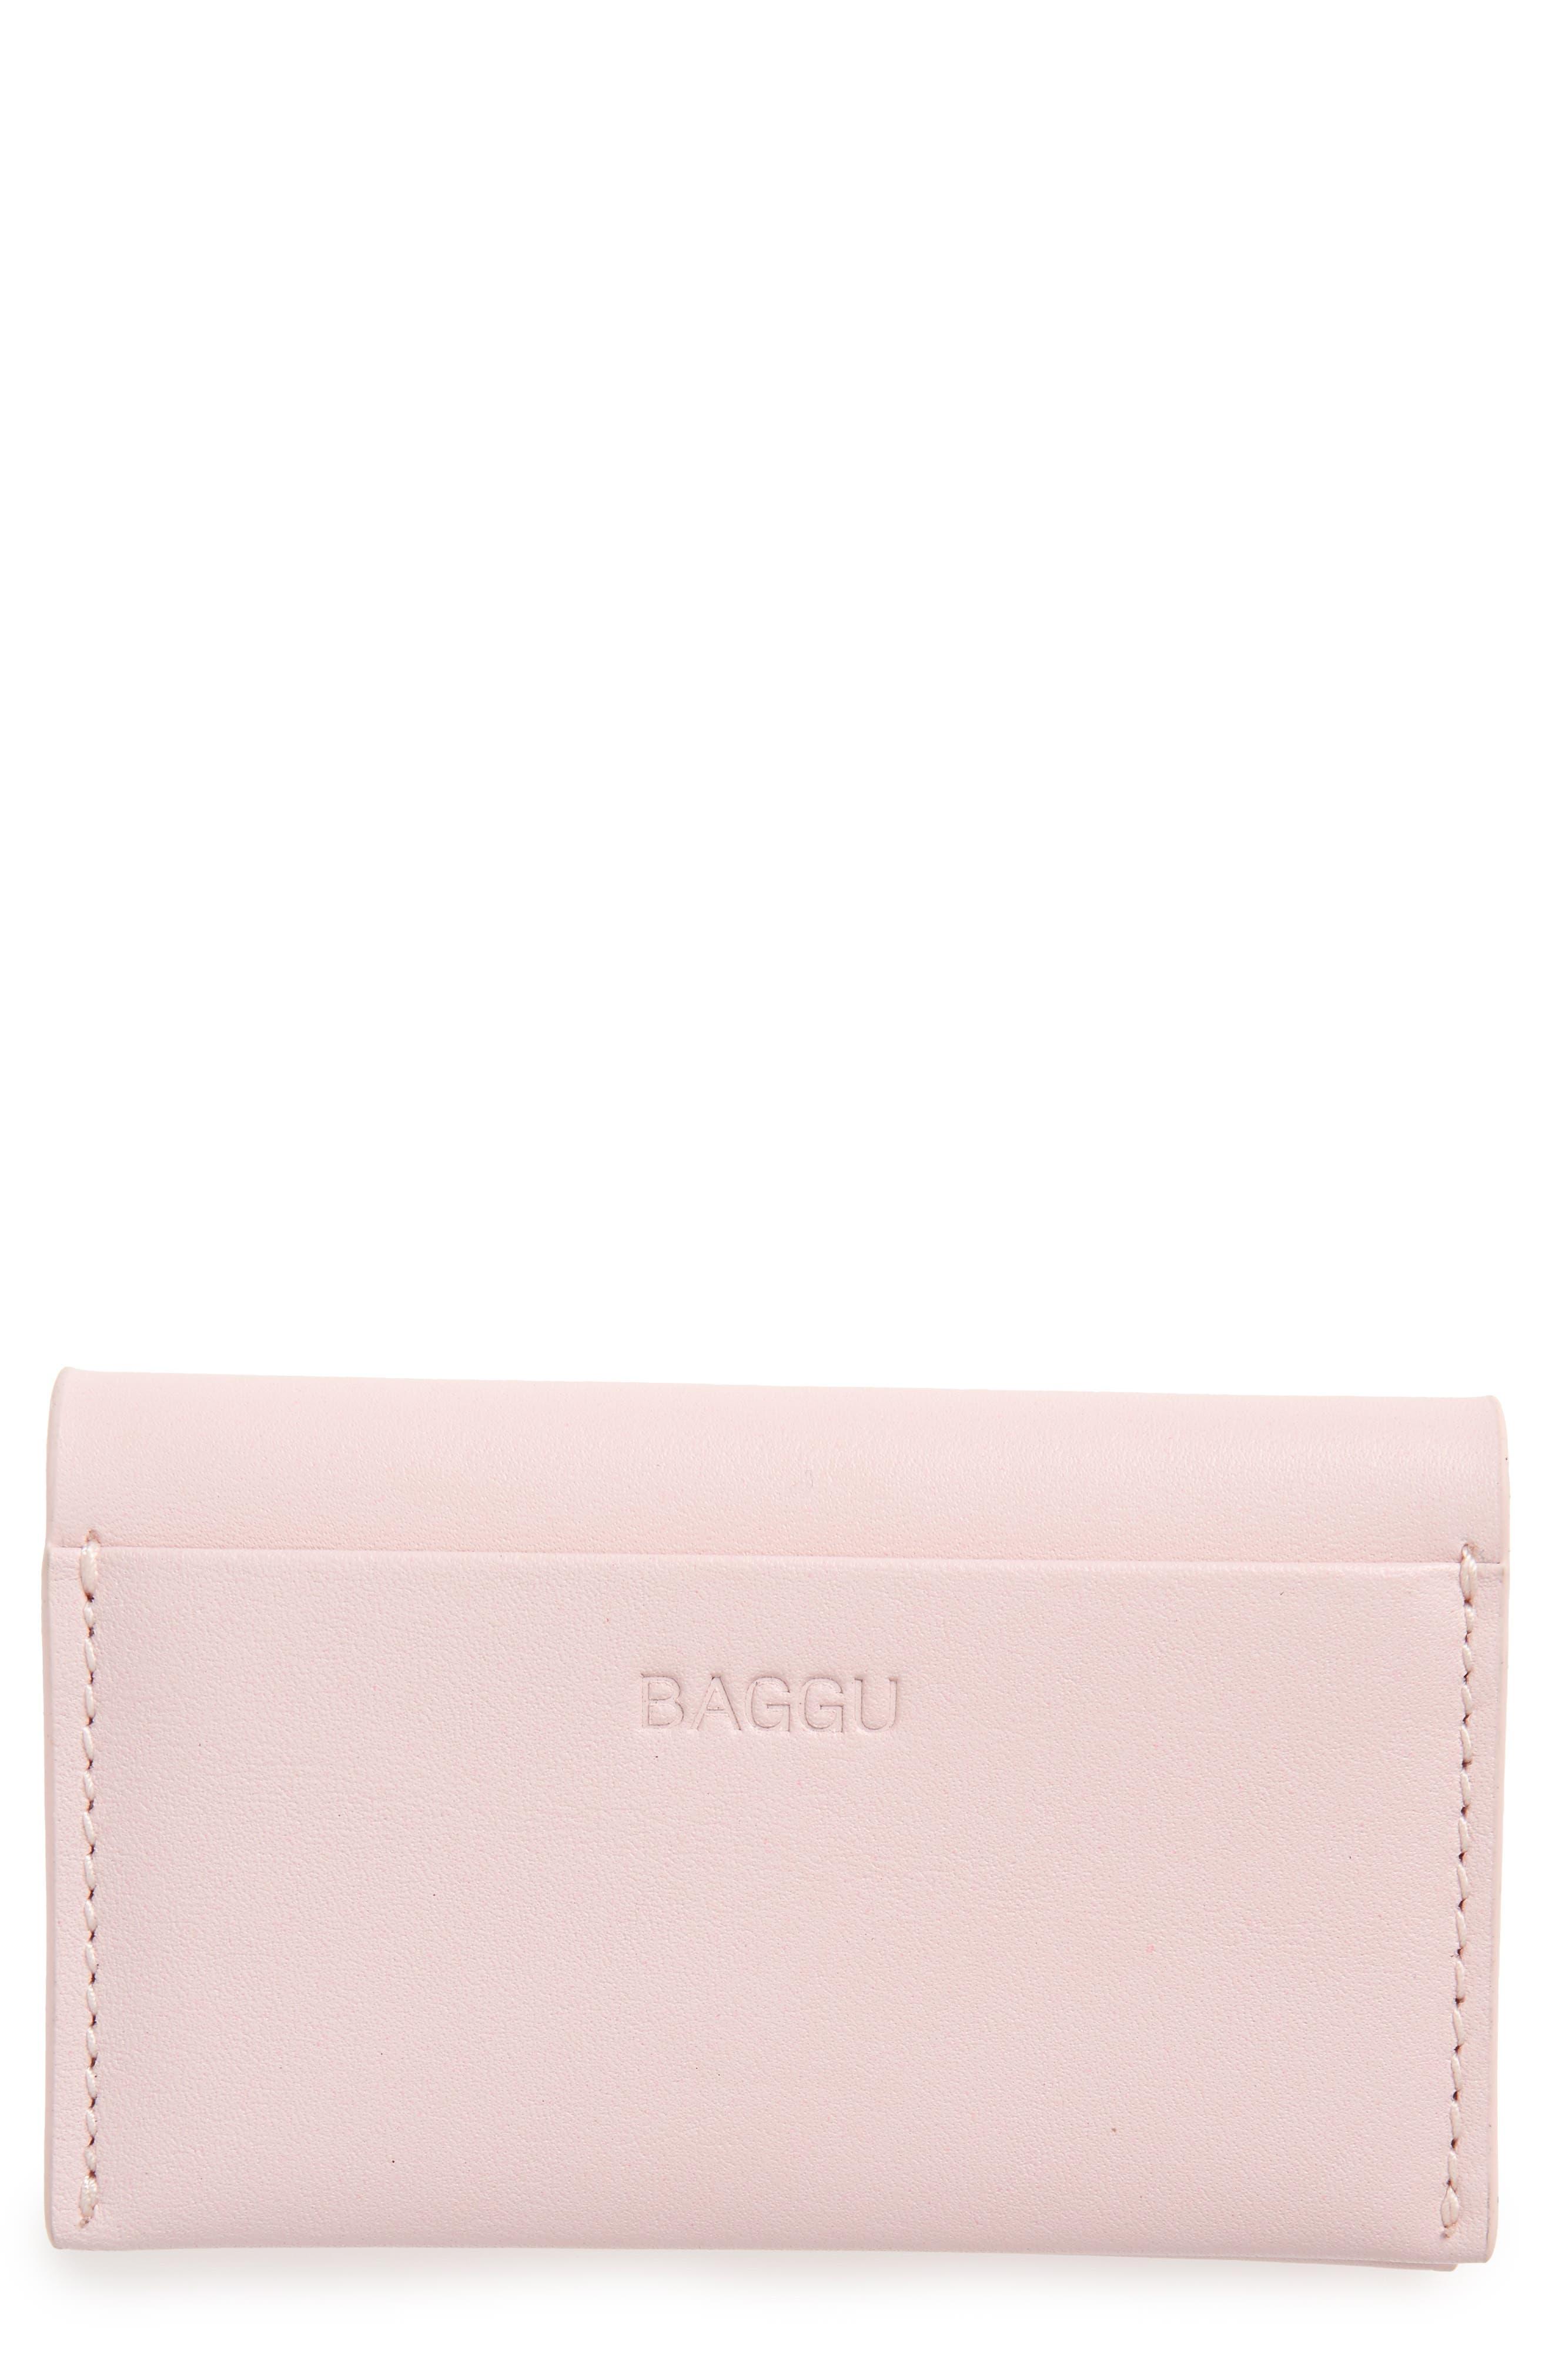 Alternate Image 1 Selected - Baggu Leather Card Case